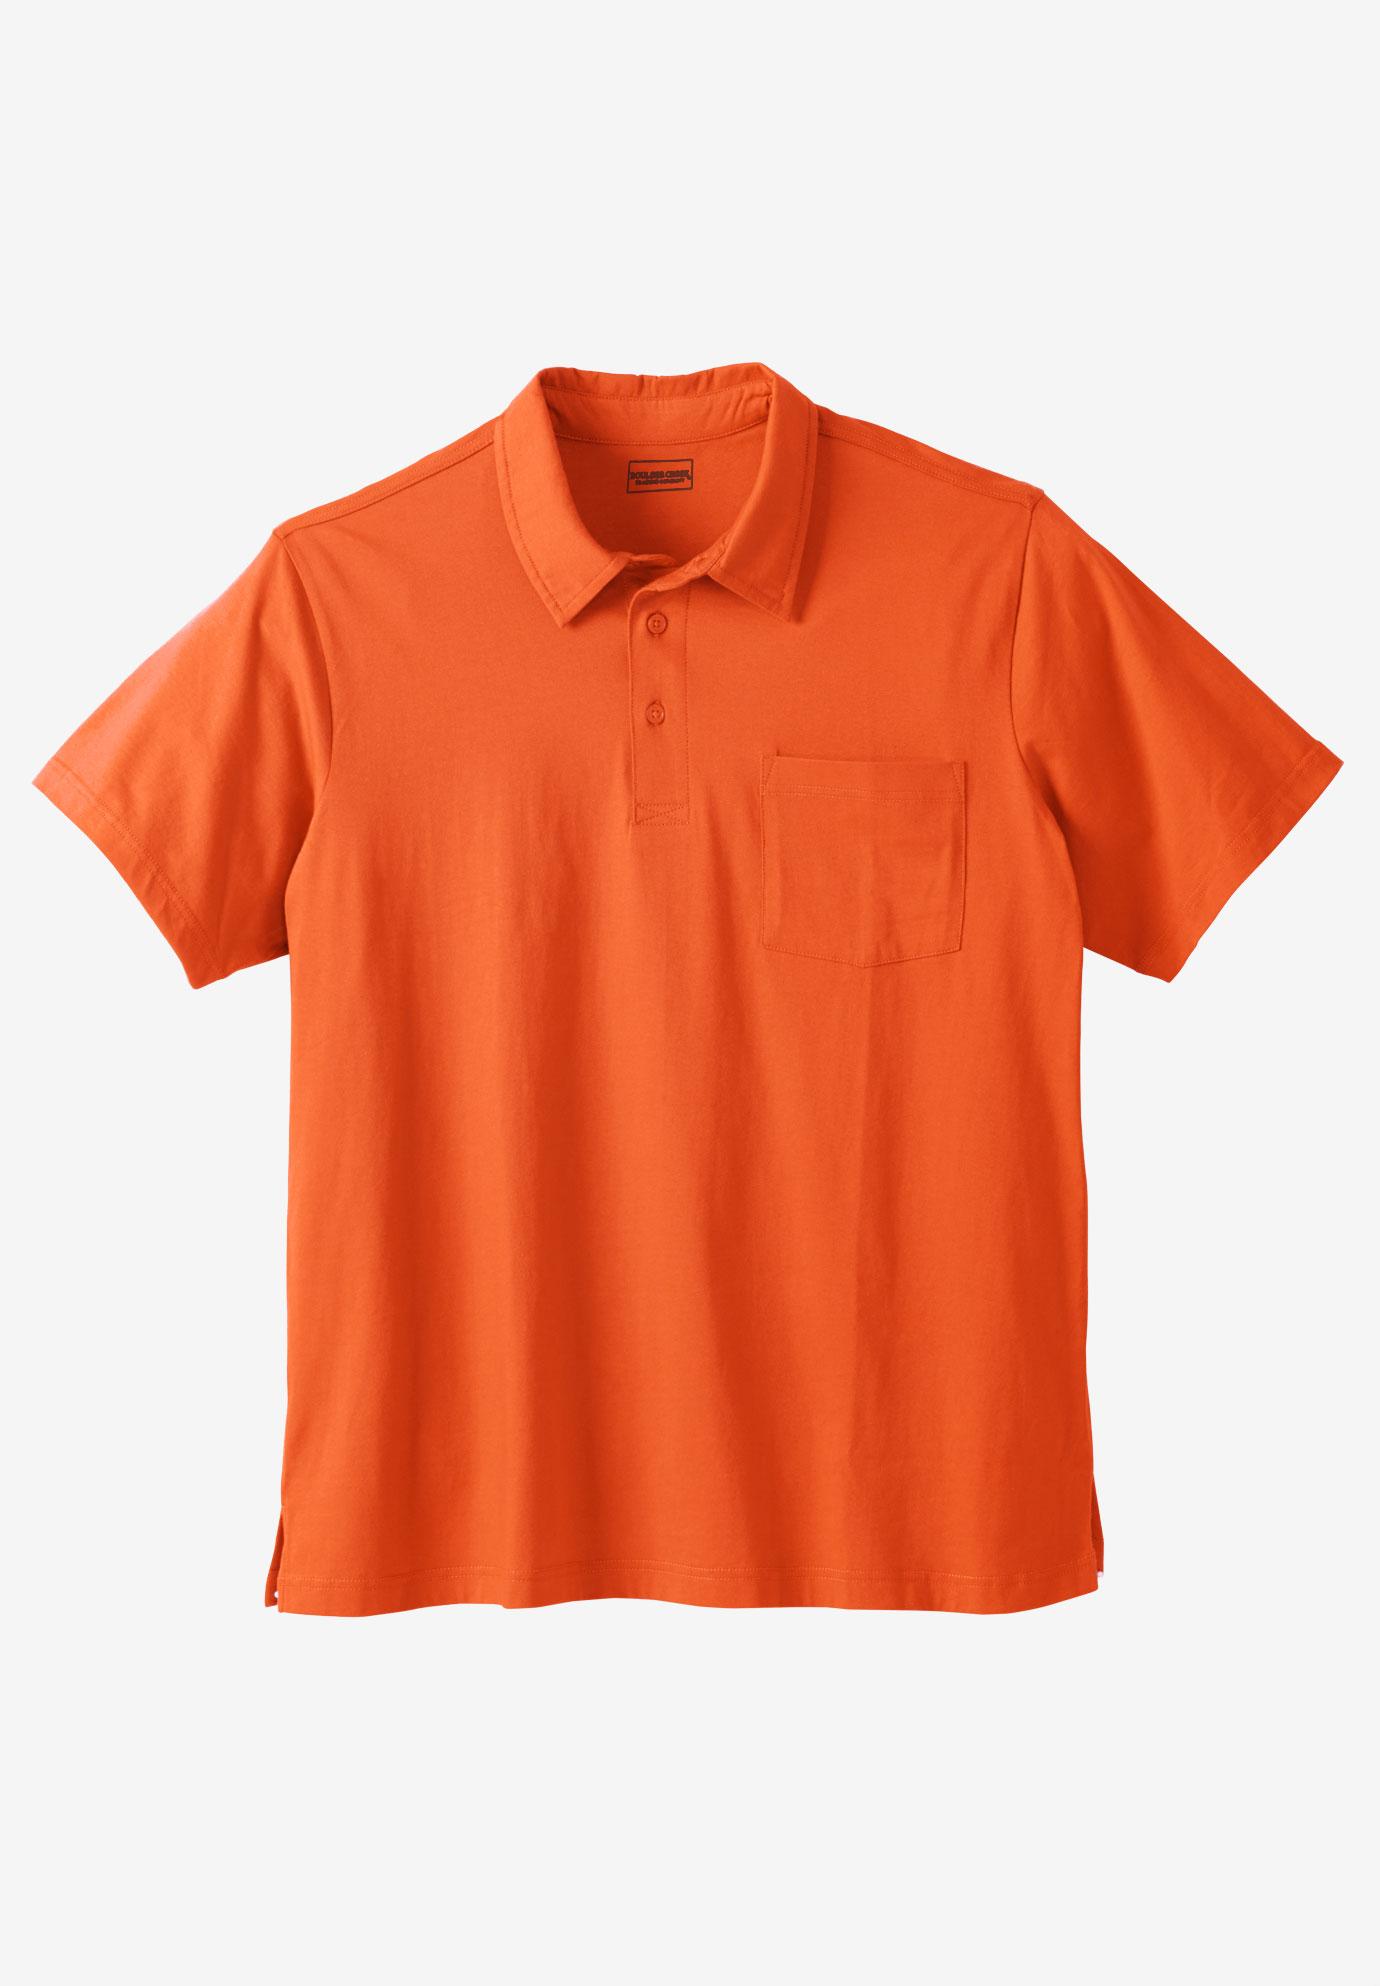 King Size Shirts